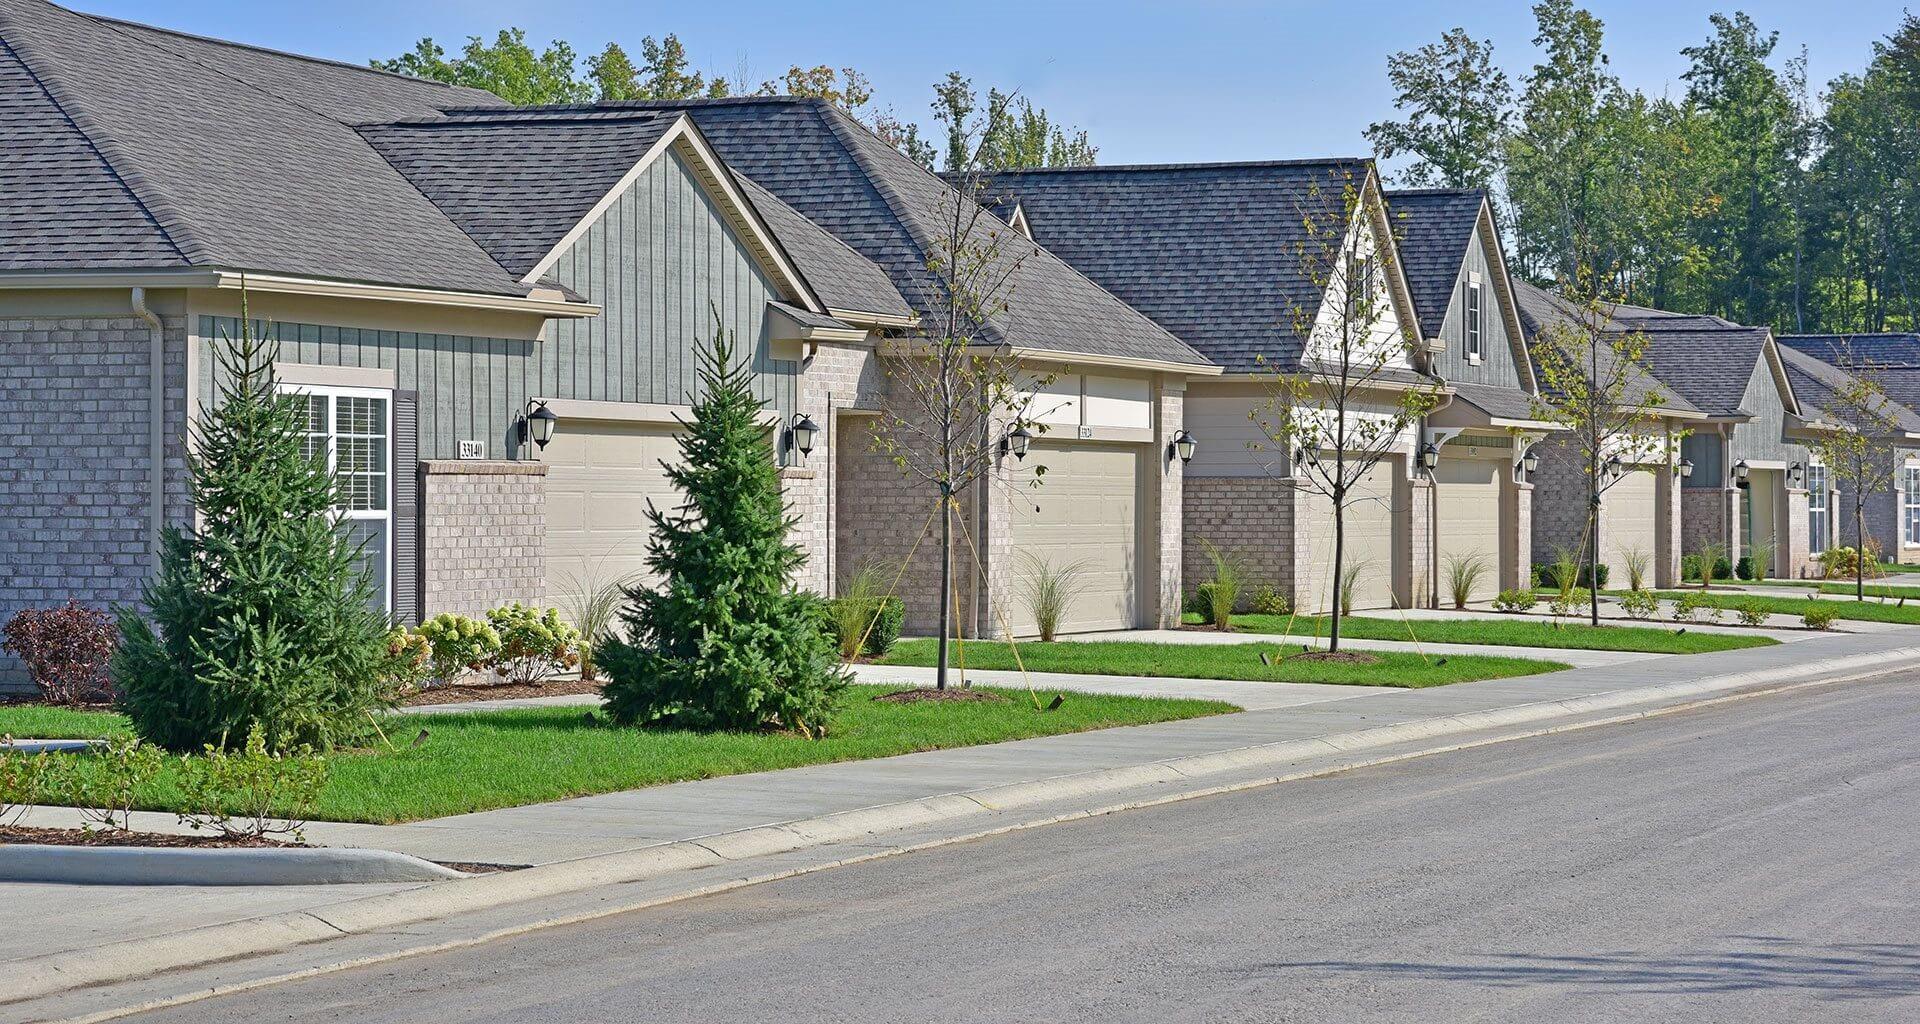 Luxury 55+ Townhome Living at Rose Villas - Avon, Avon, OH, 44011